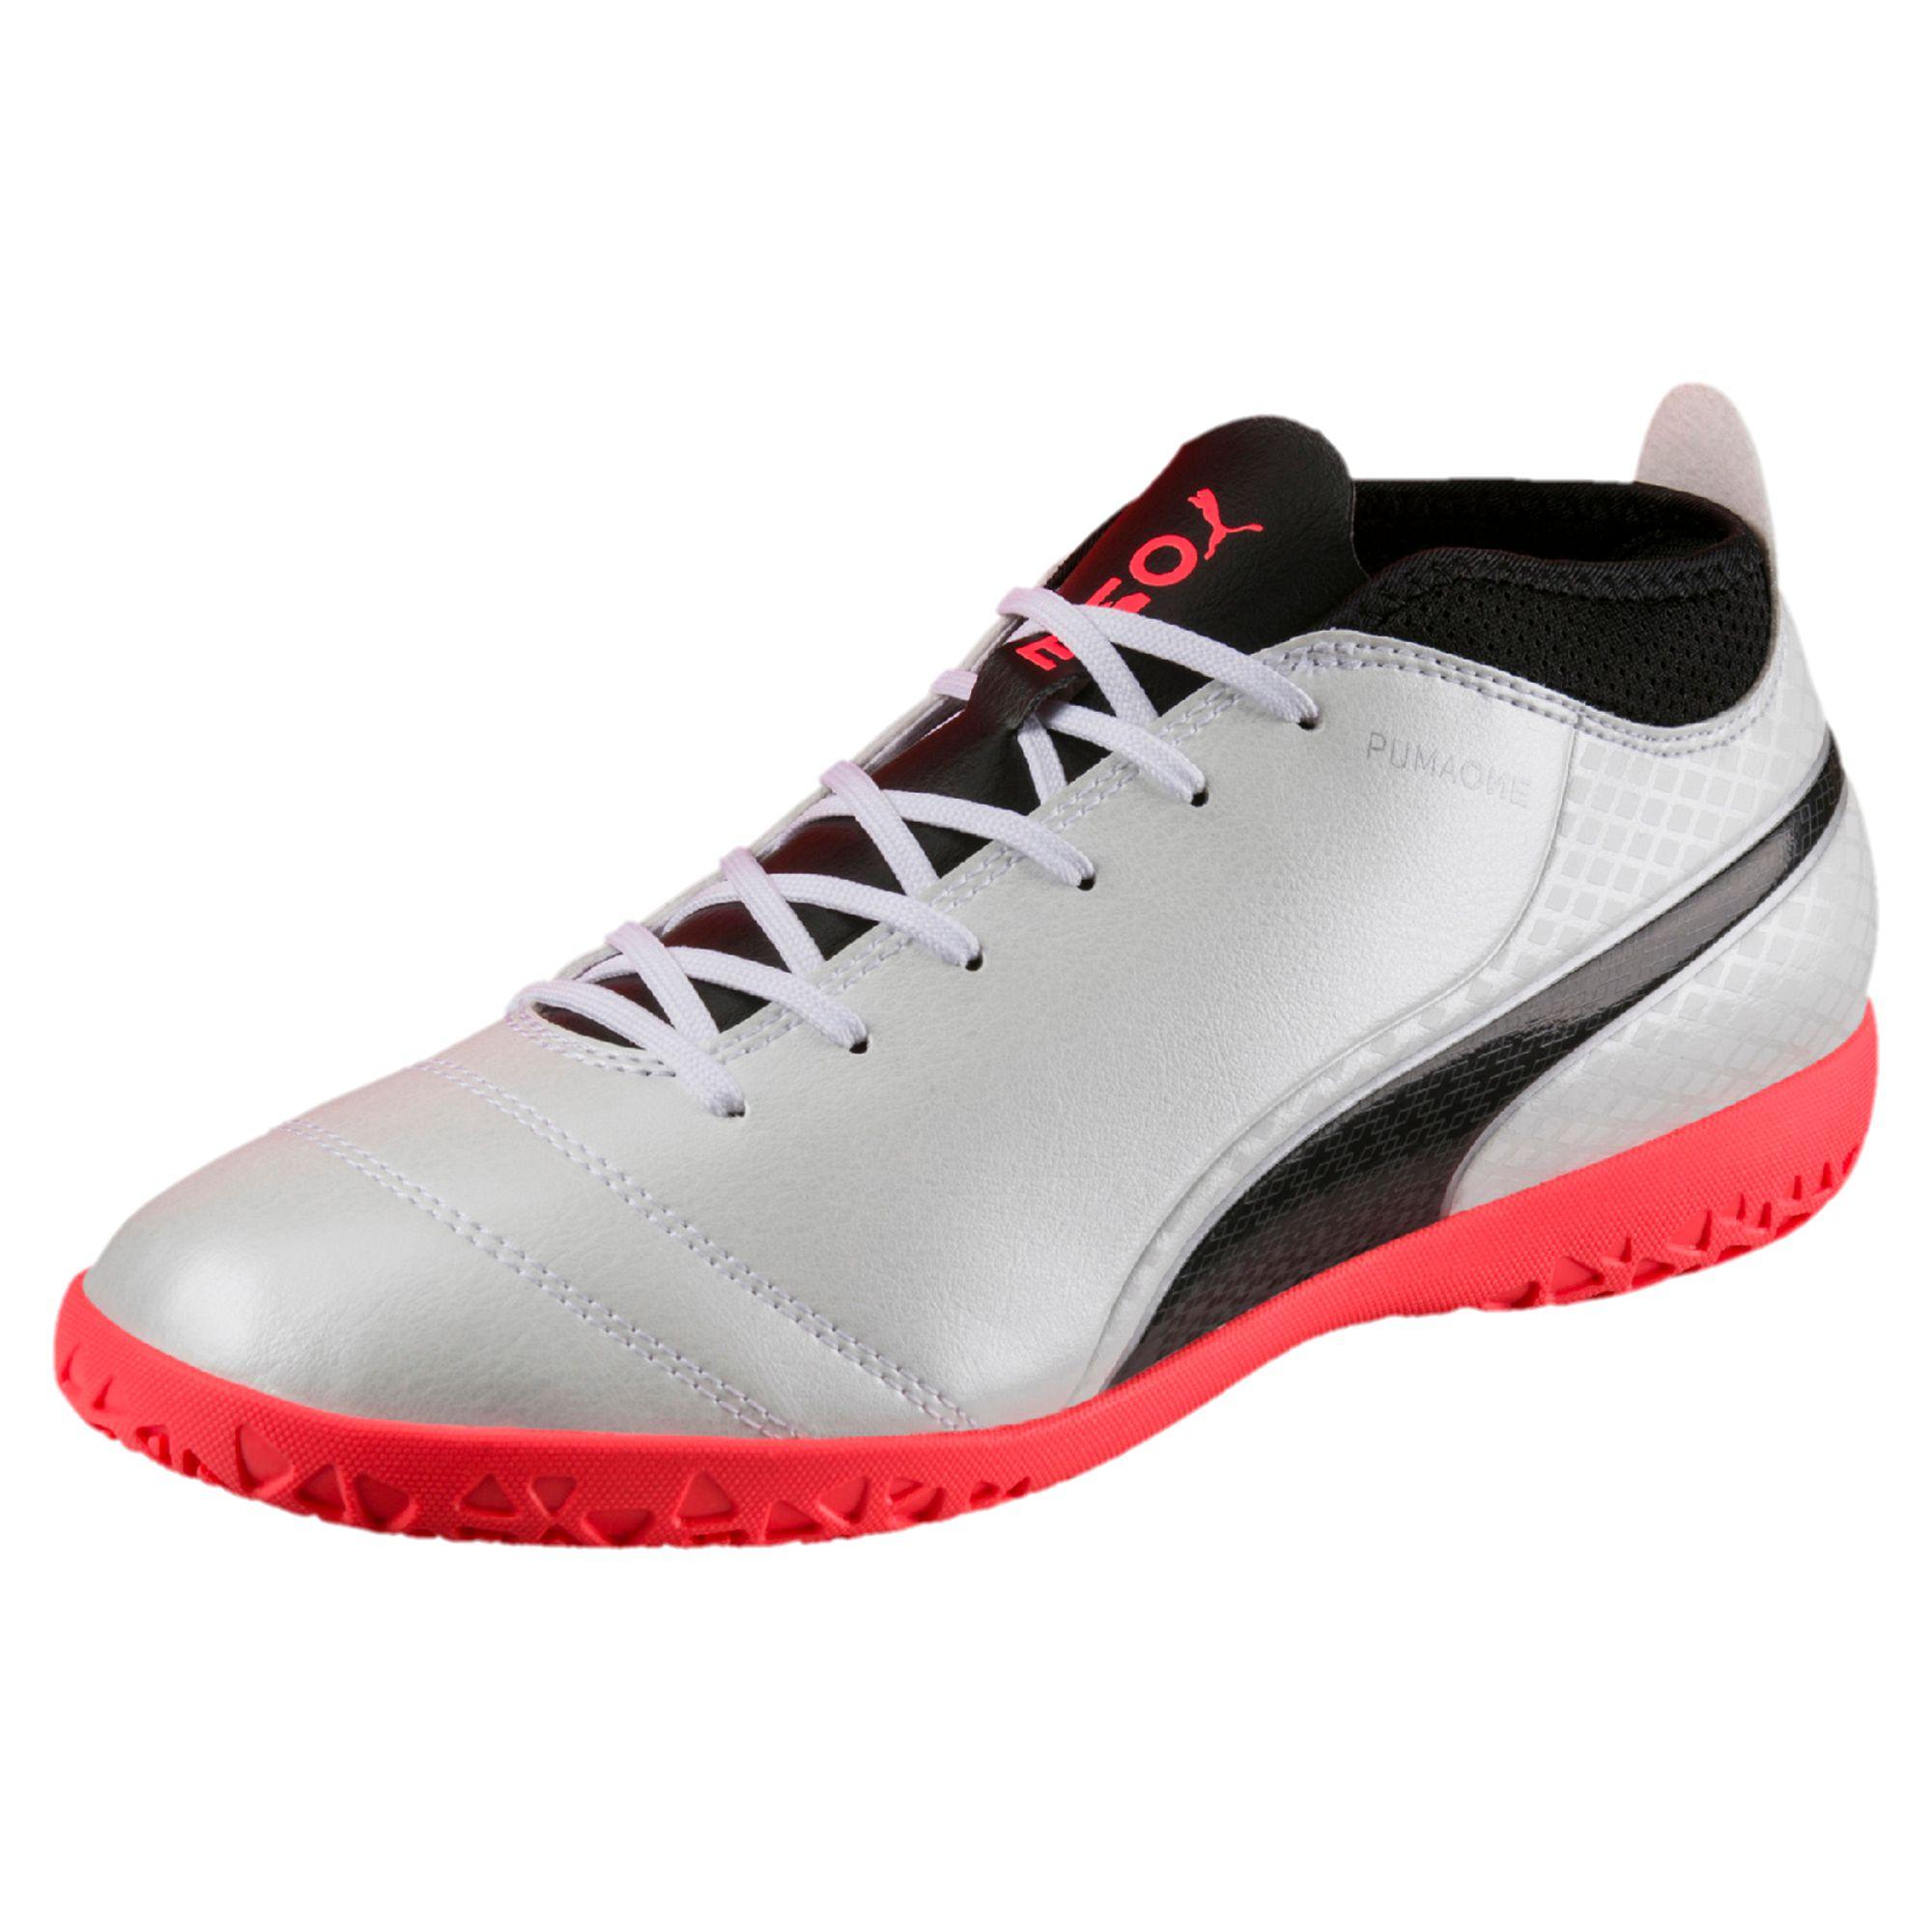 ONE 17.4 IT мужские Indoor Training обувь